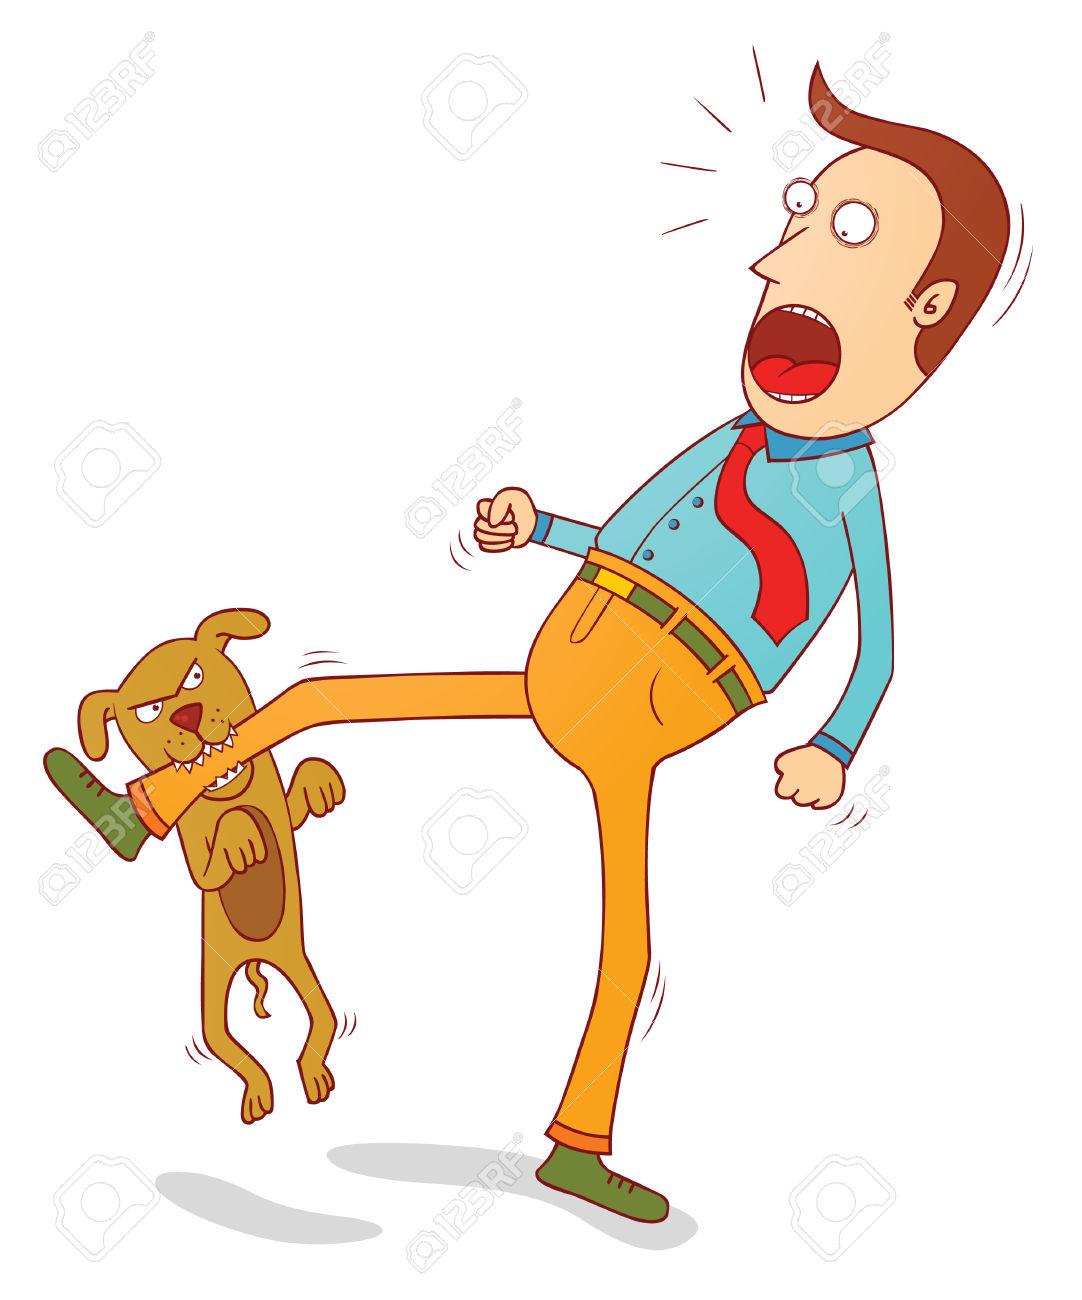 Dog Biting Foot Video